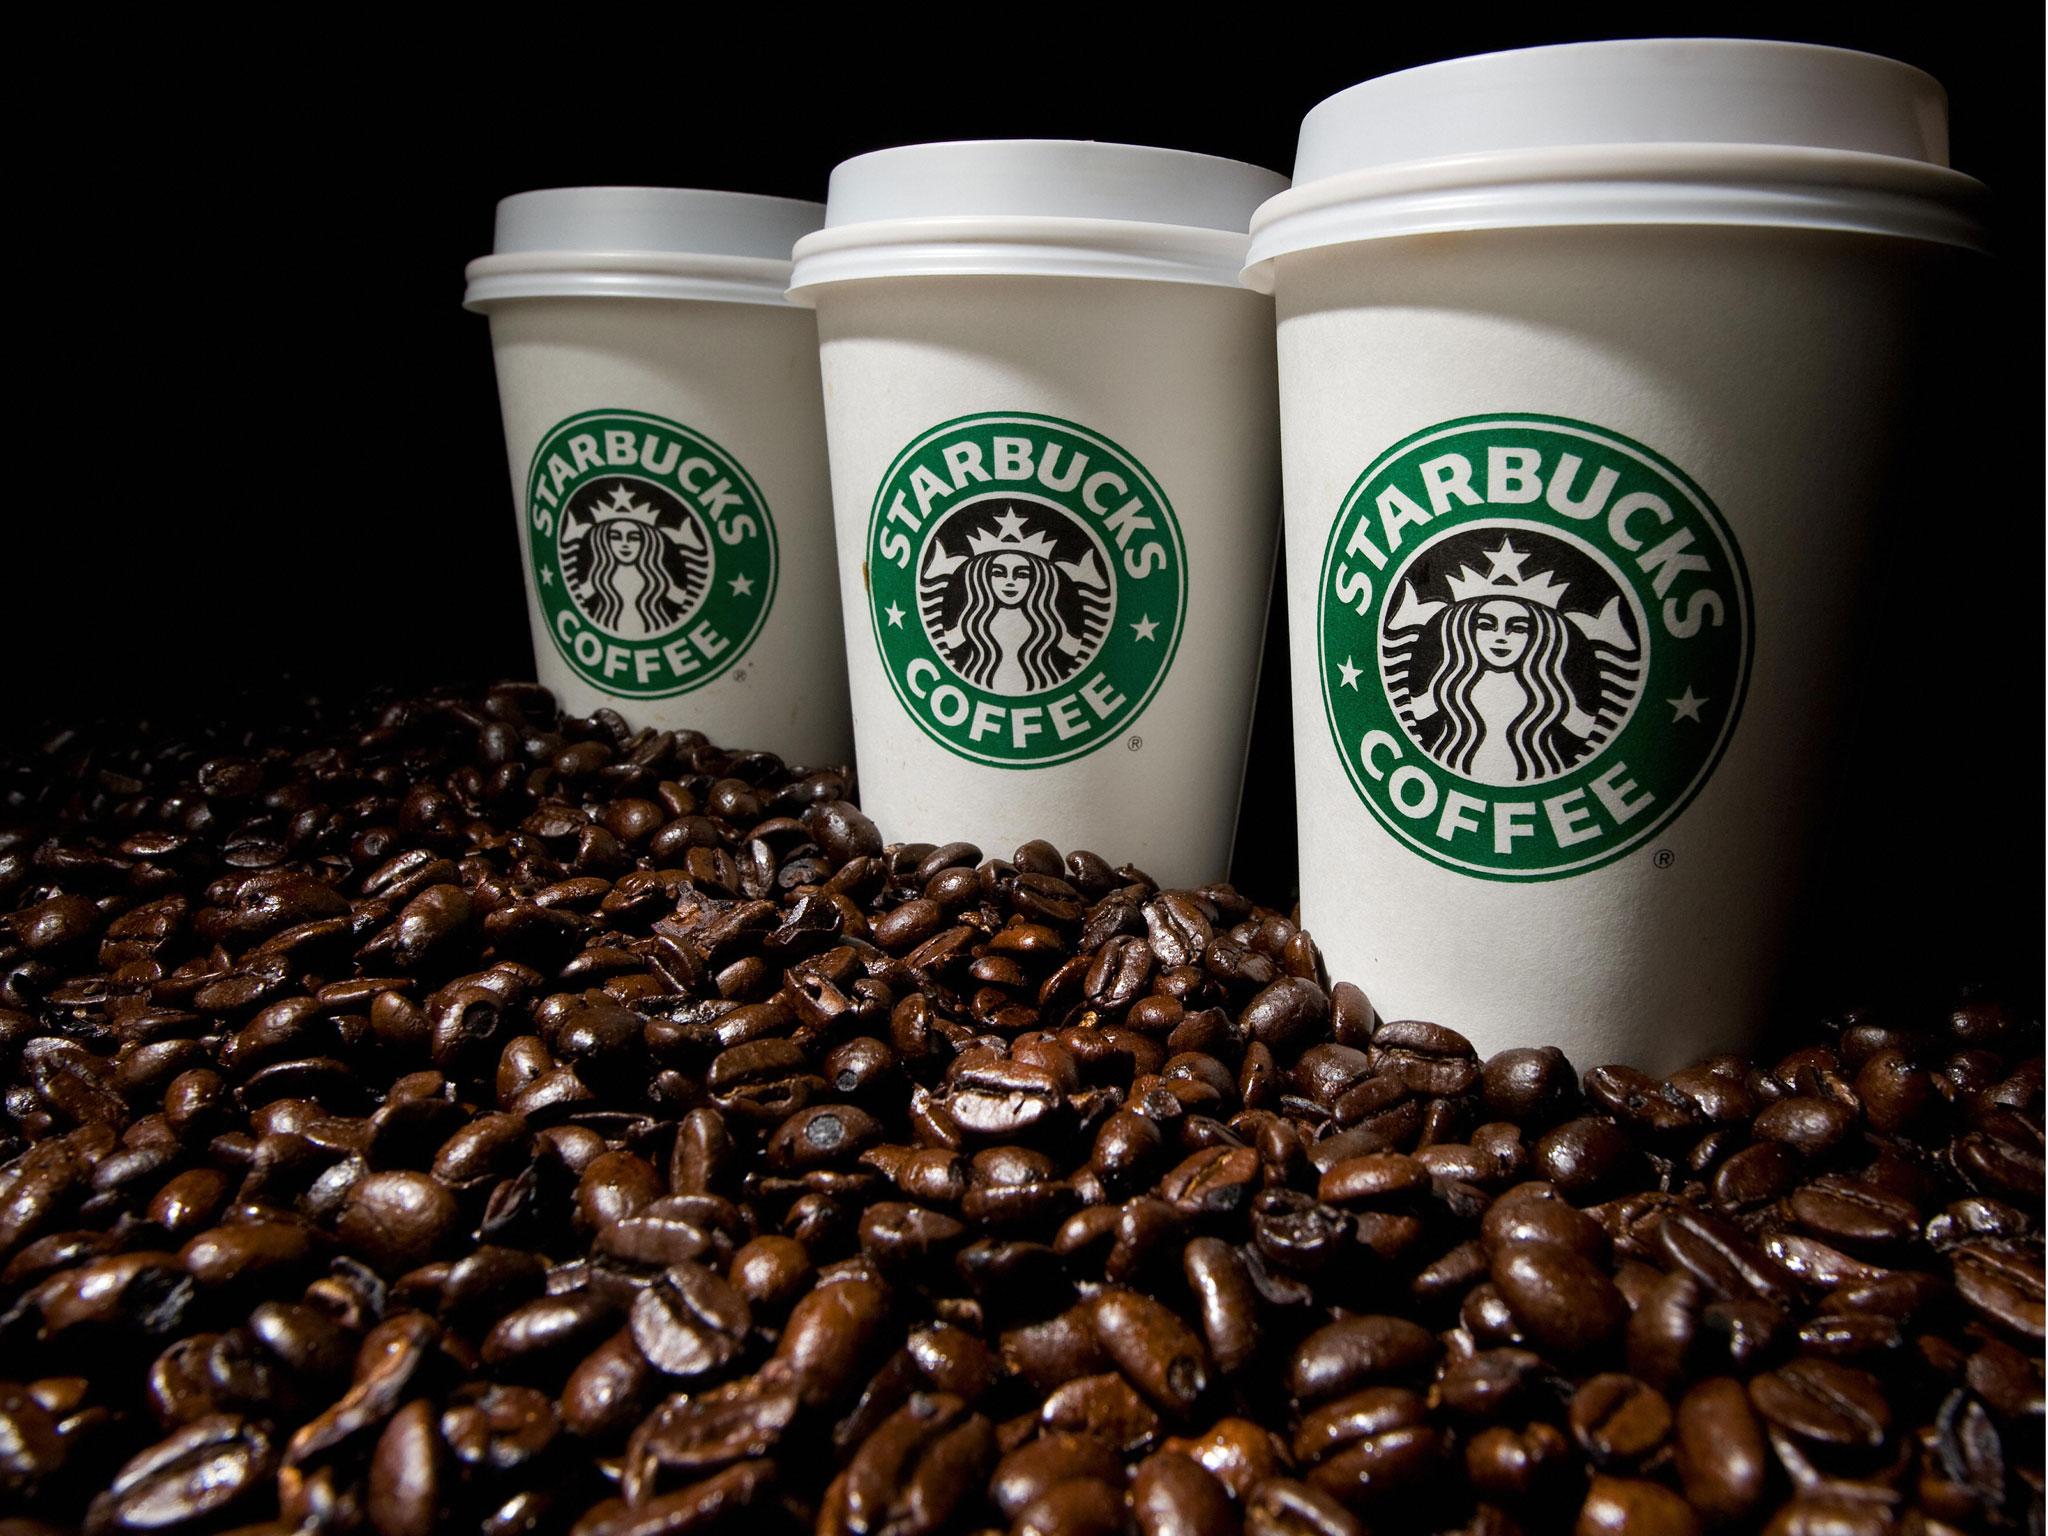 Starbucks Coffee Wallpaper 2048x1536 24916